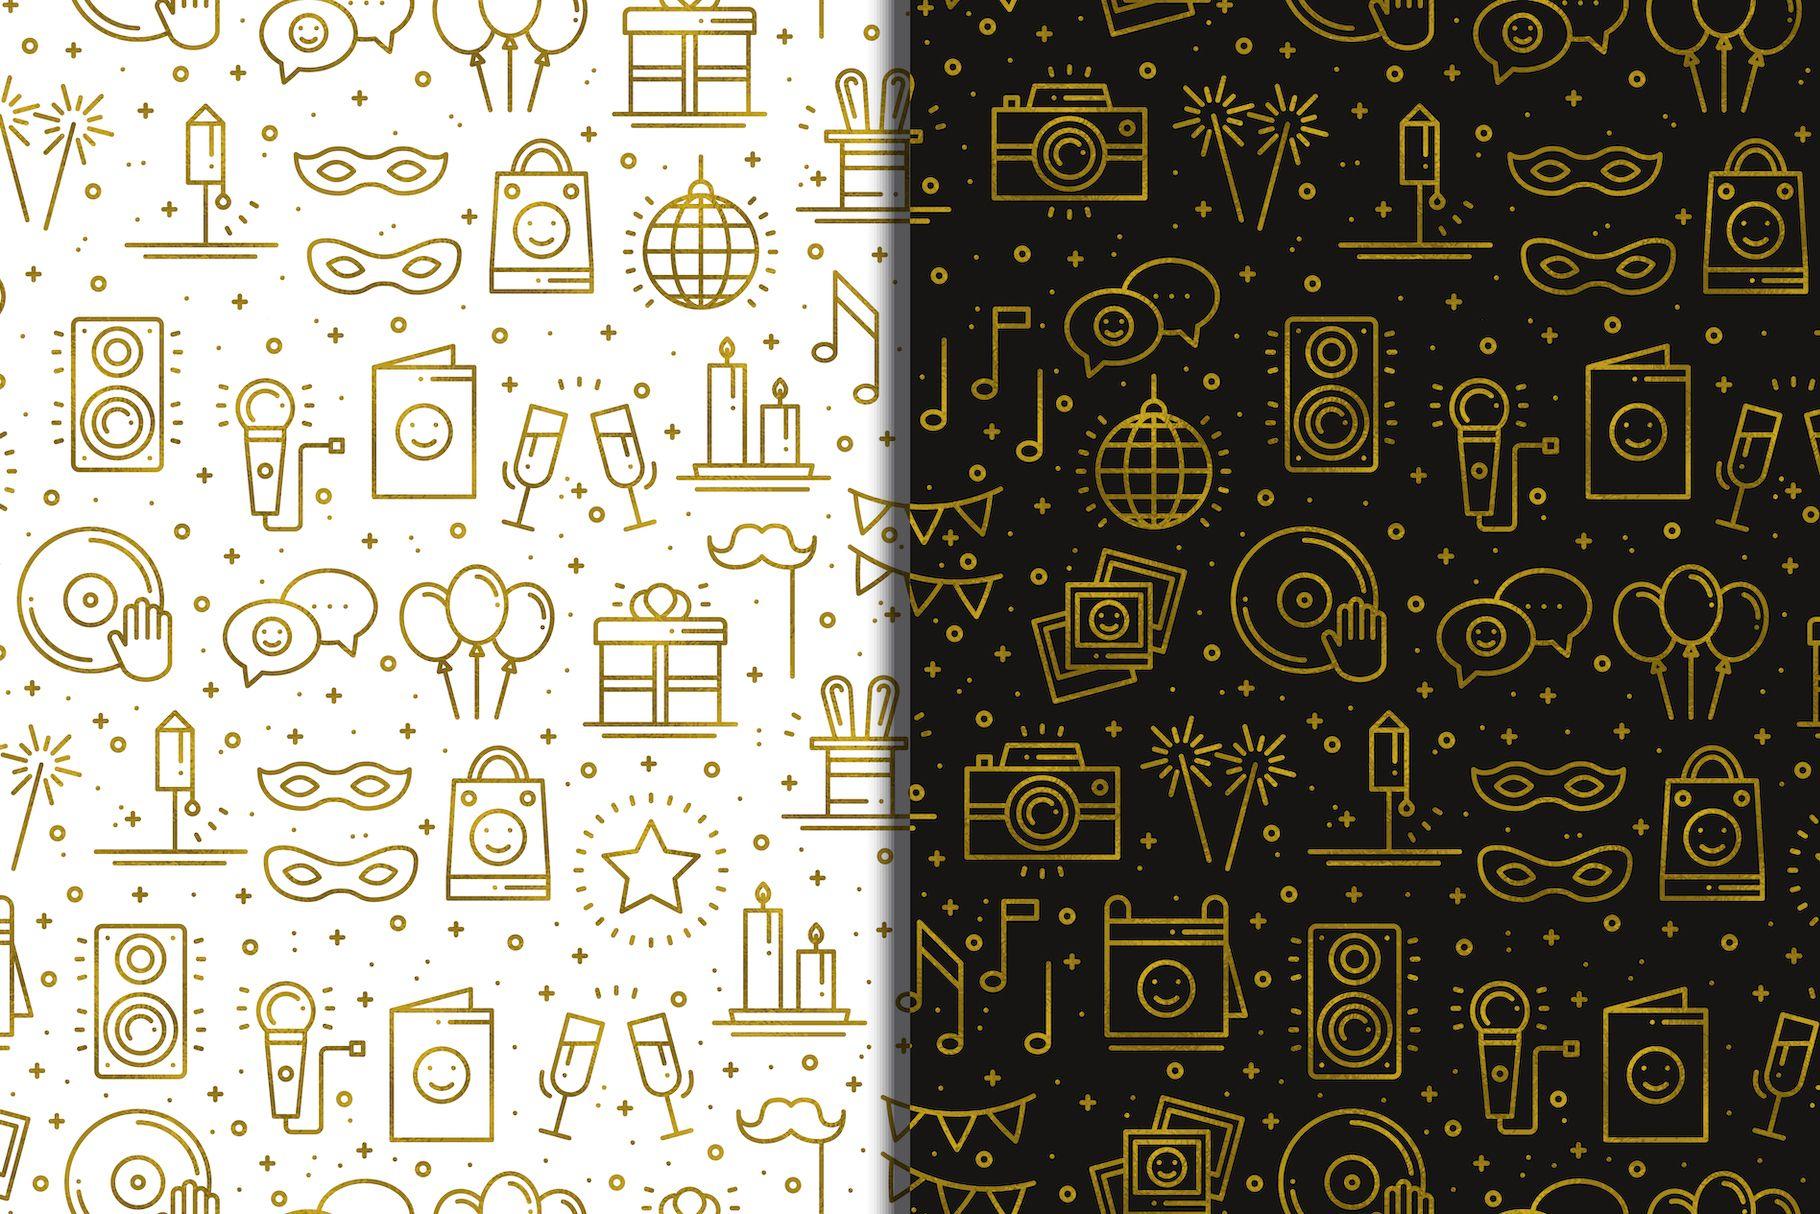 Download Golden Birthday Party Patterns 481071 Patterns Design Bundles Golden Birthday Parties Golden Birthday Flyer Design Templates